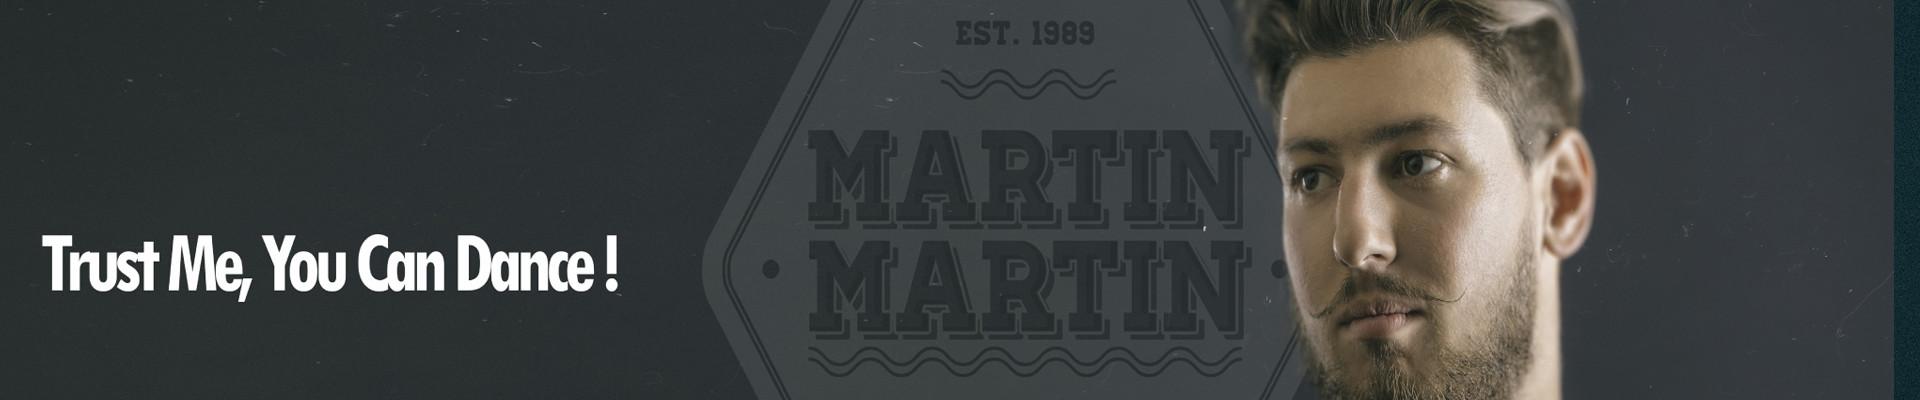 Aheader MartinX2